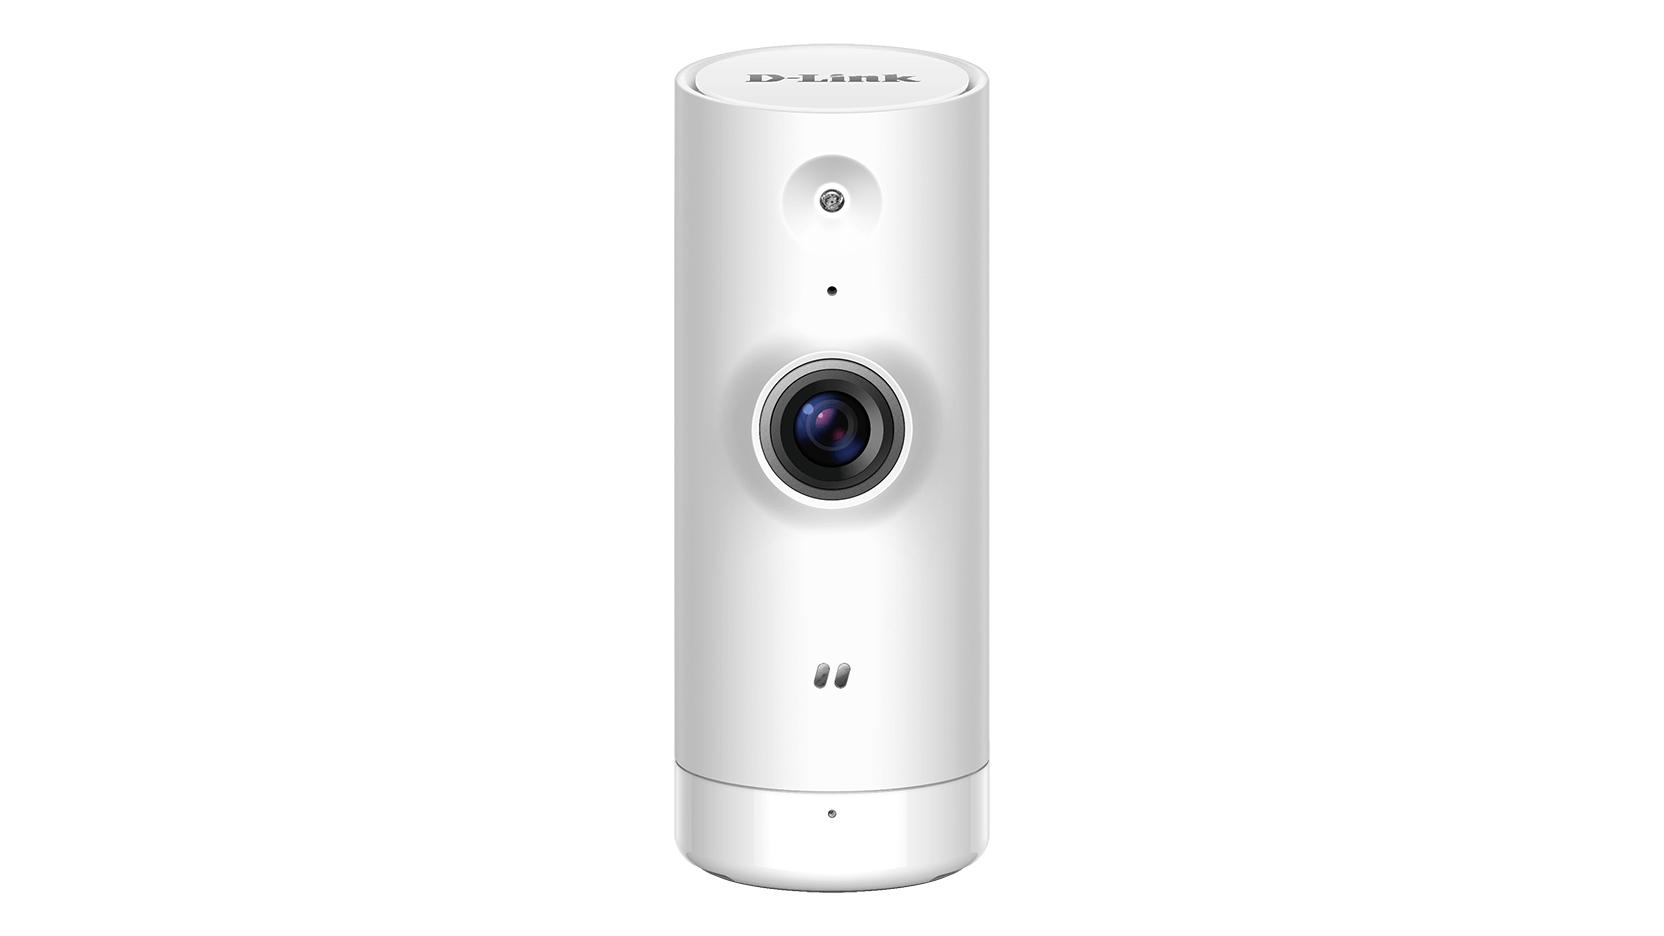 D-Link Mini HD Cámara de seguridad IP Interior Escritorio 1280 x 720 Pixeles